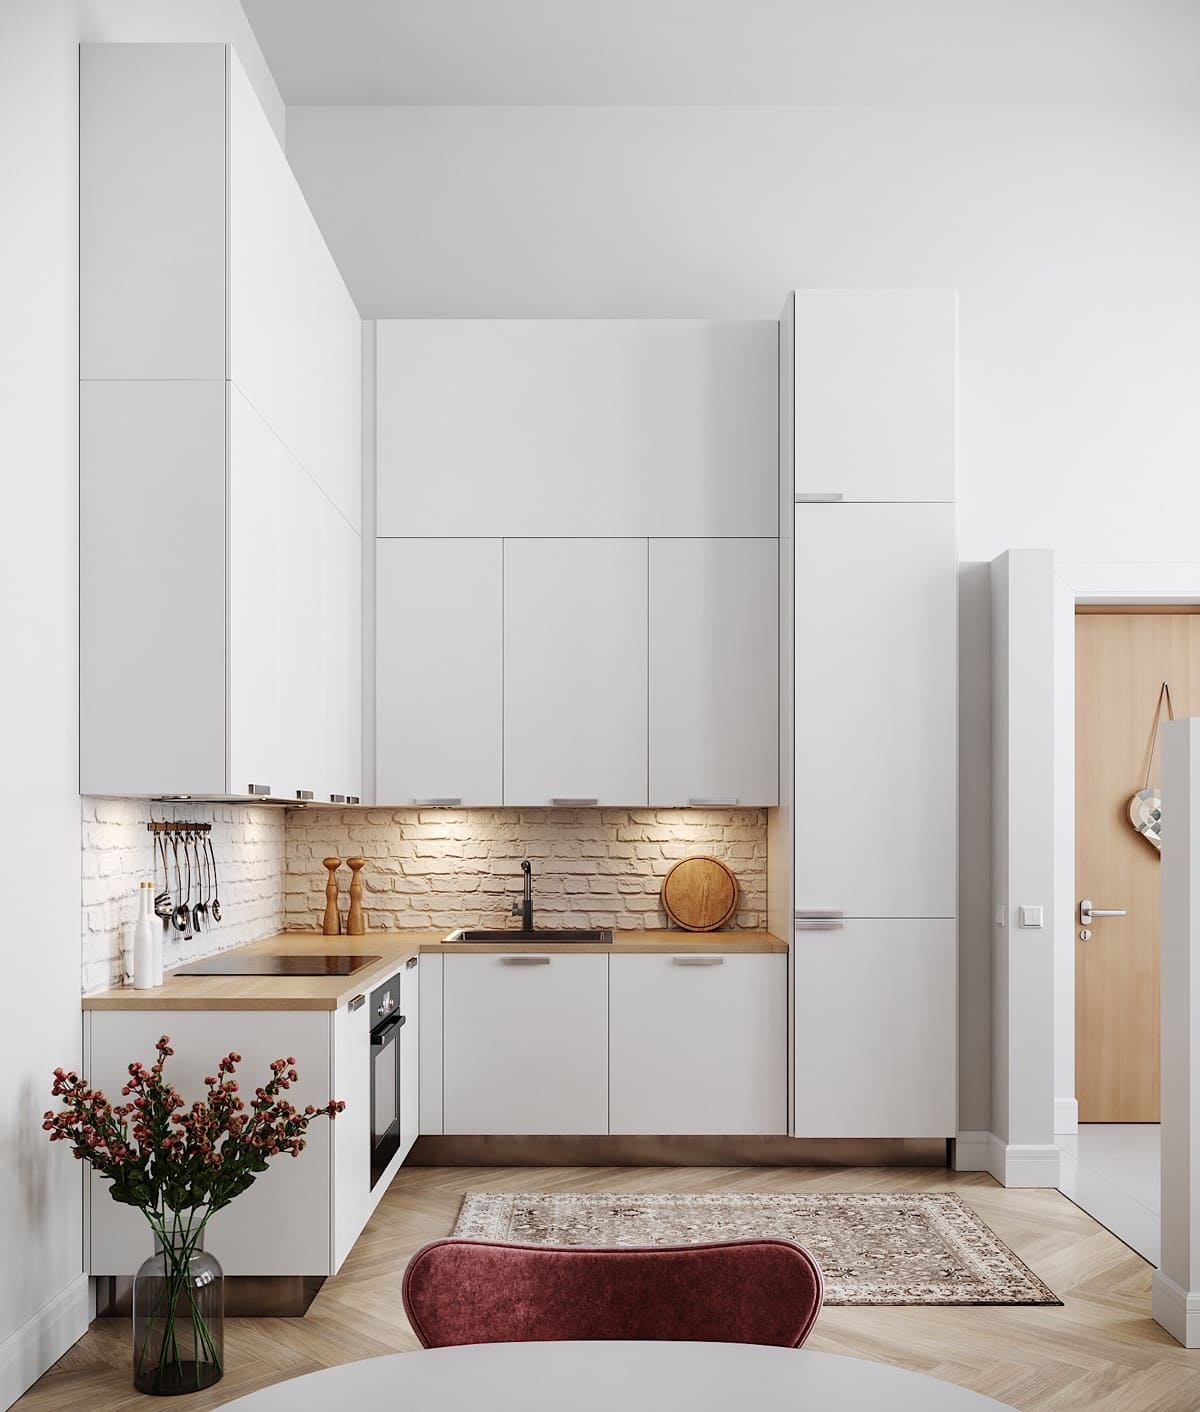 дизайн интерьера модной квартиры фото 40